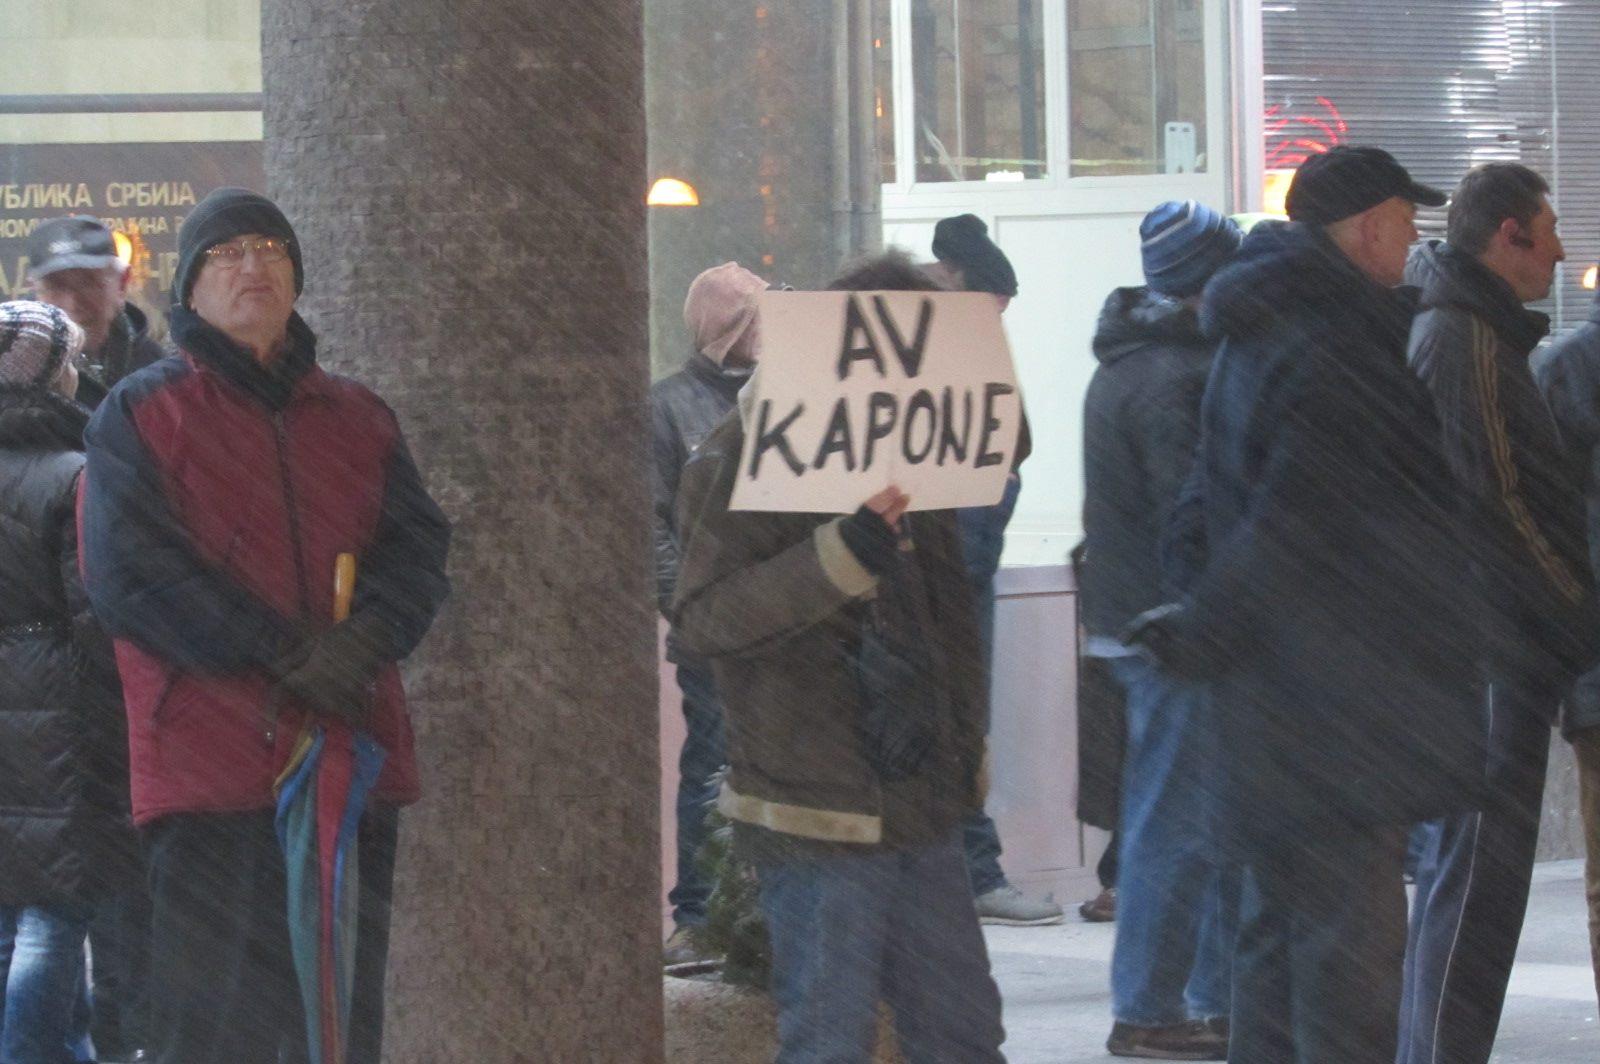 Protest u Pančevu 25. januara 2019.